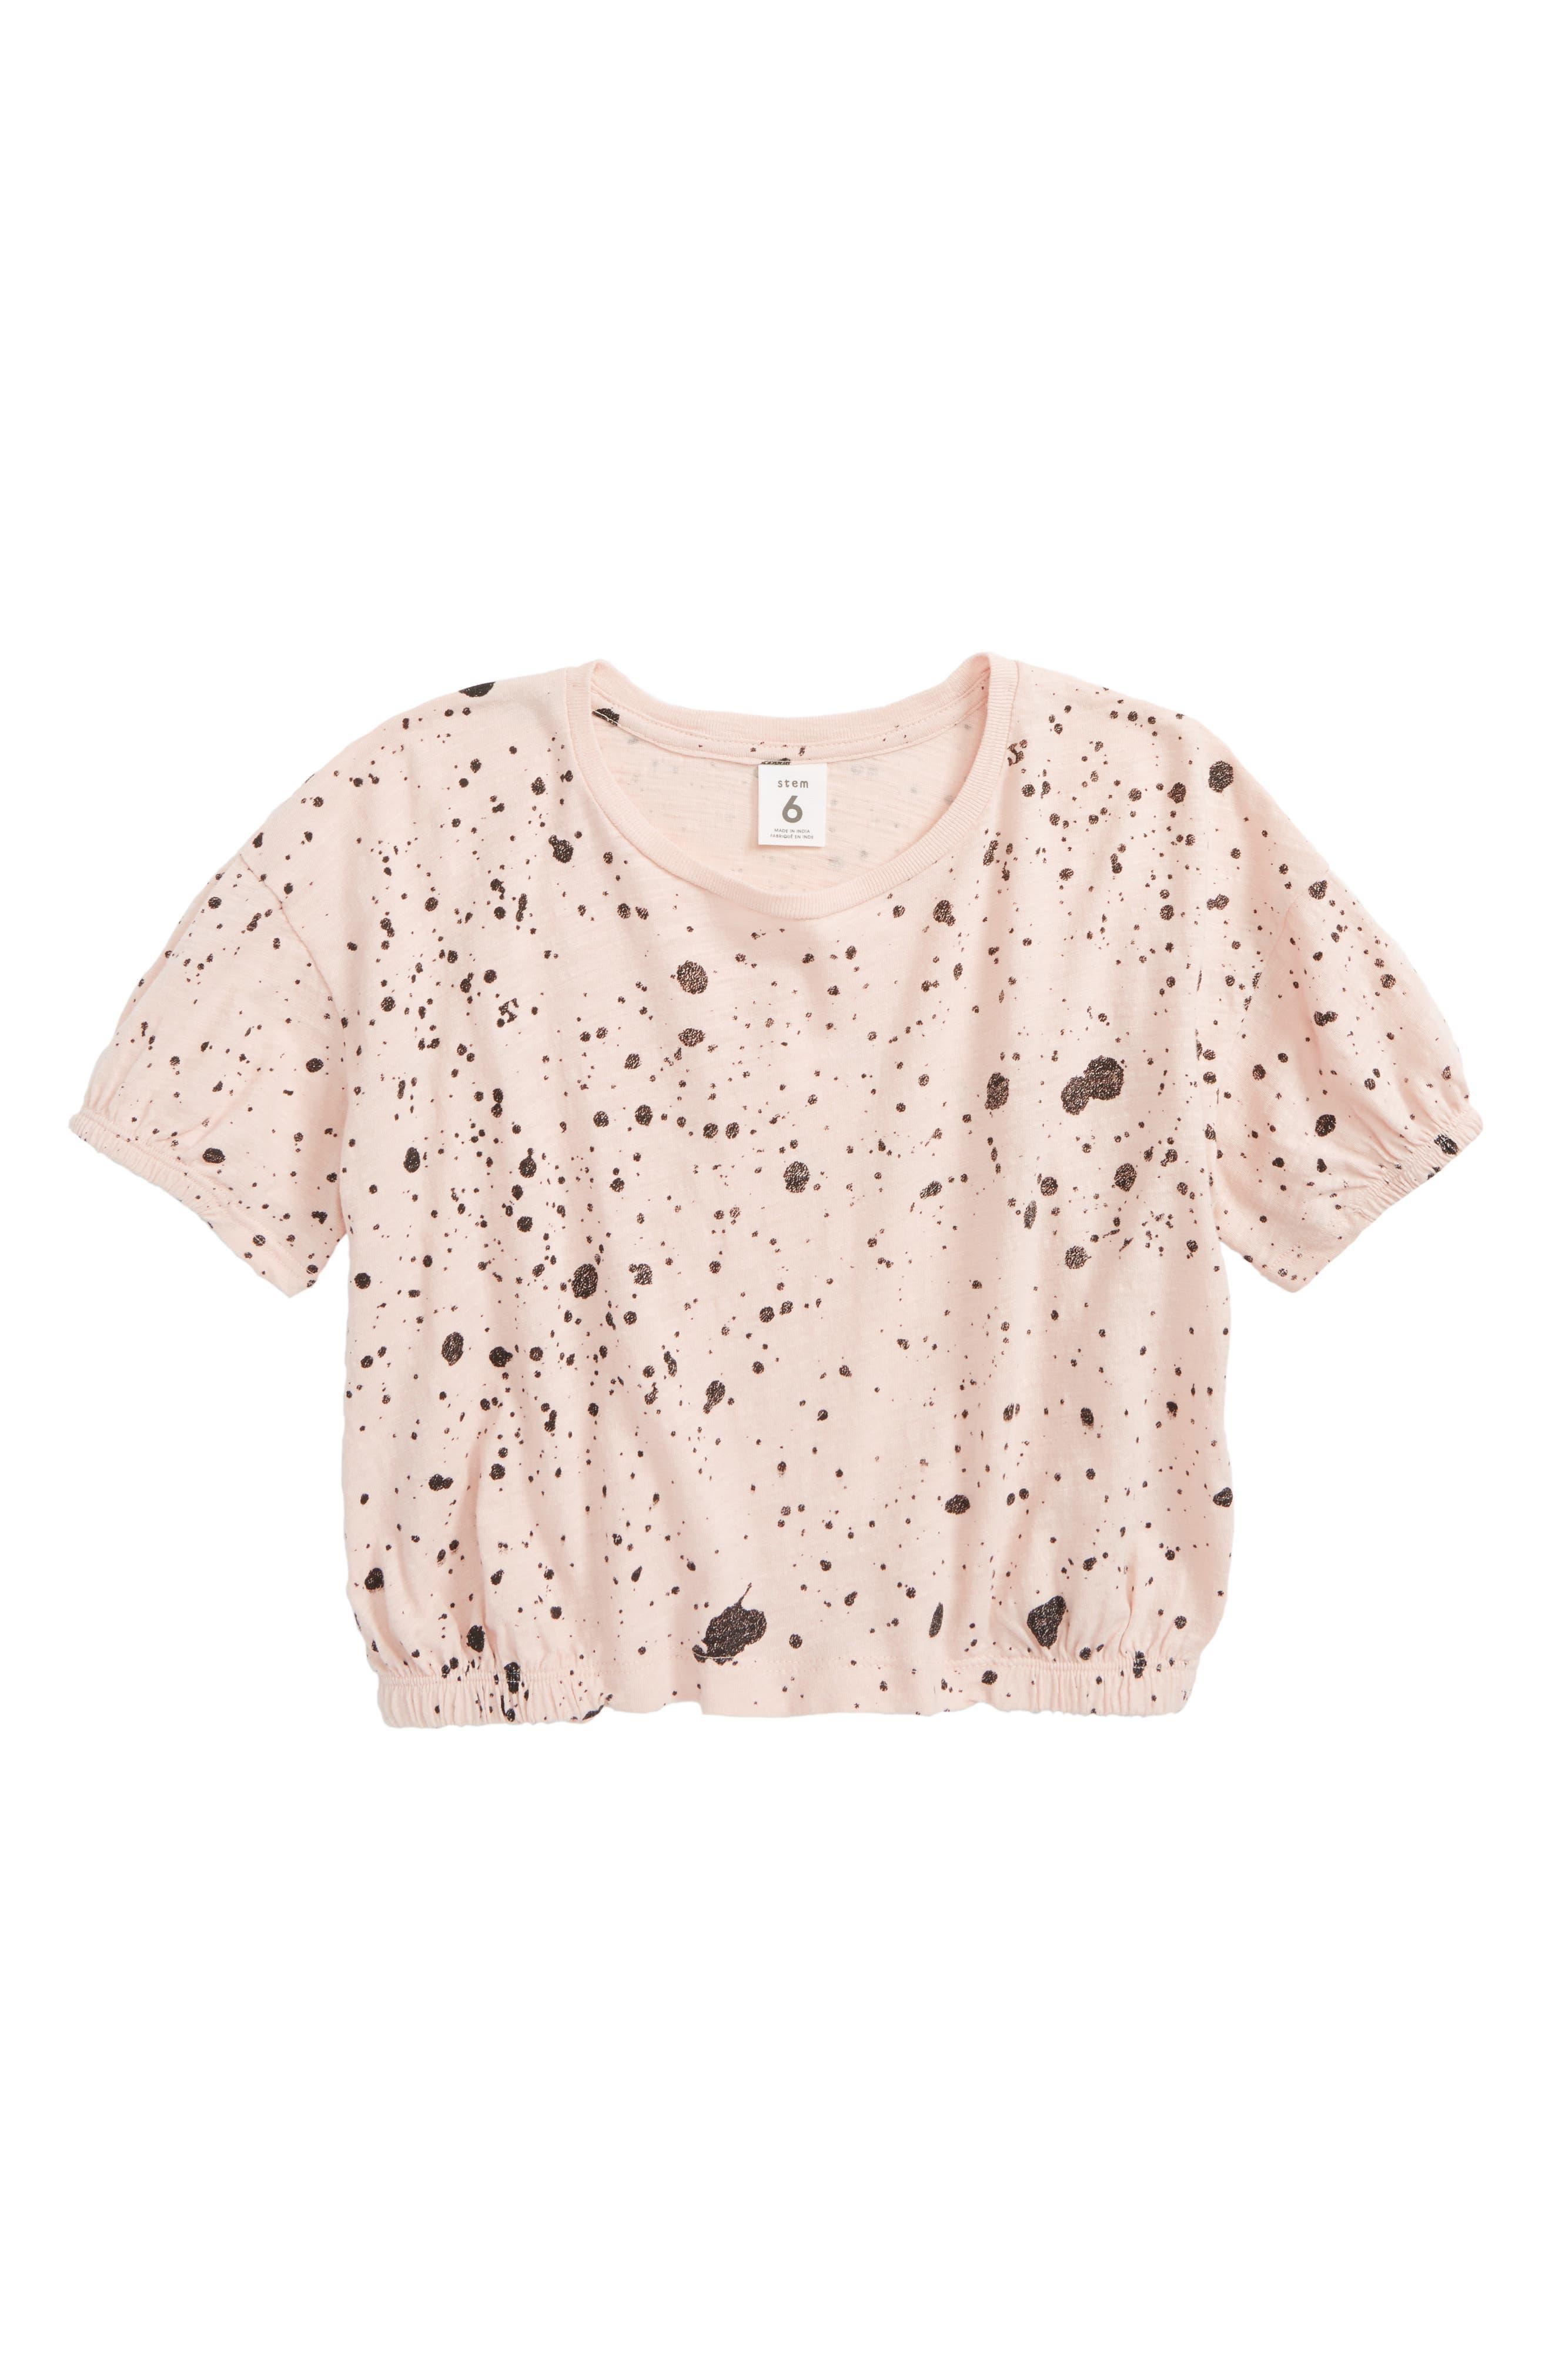 Gathered Sleeve Tee,                             Main thumbnail 1, color,                             Pink Smoke Paint Splatter